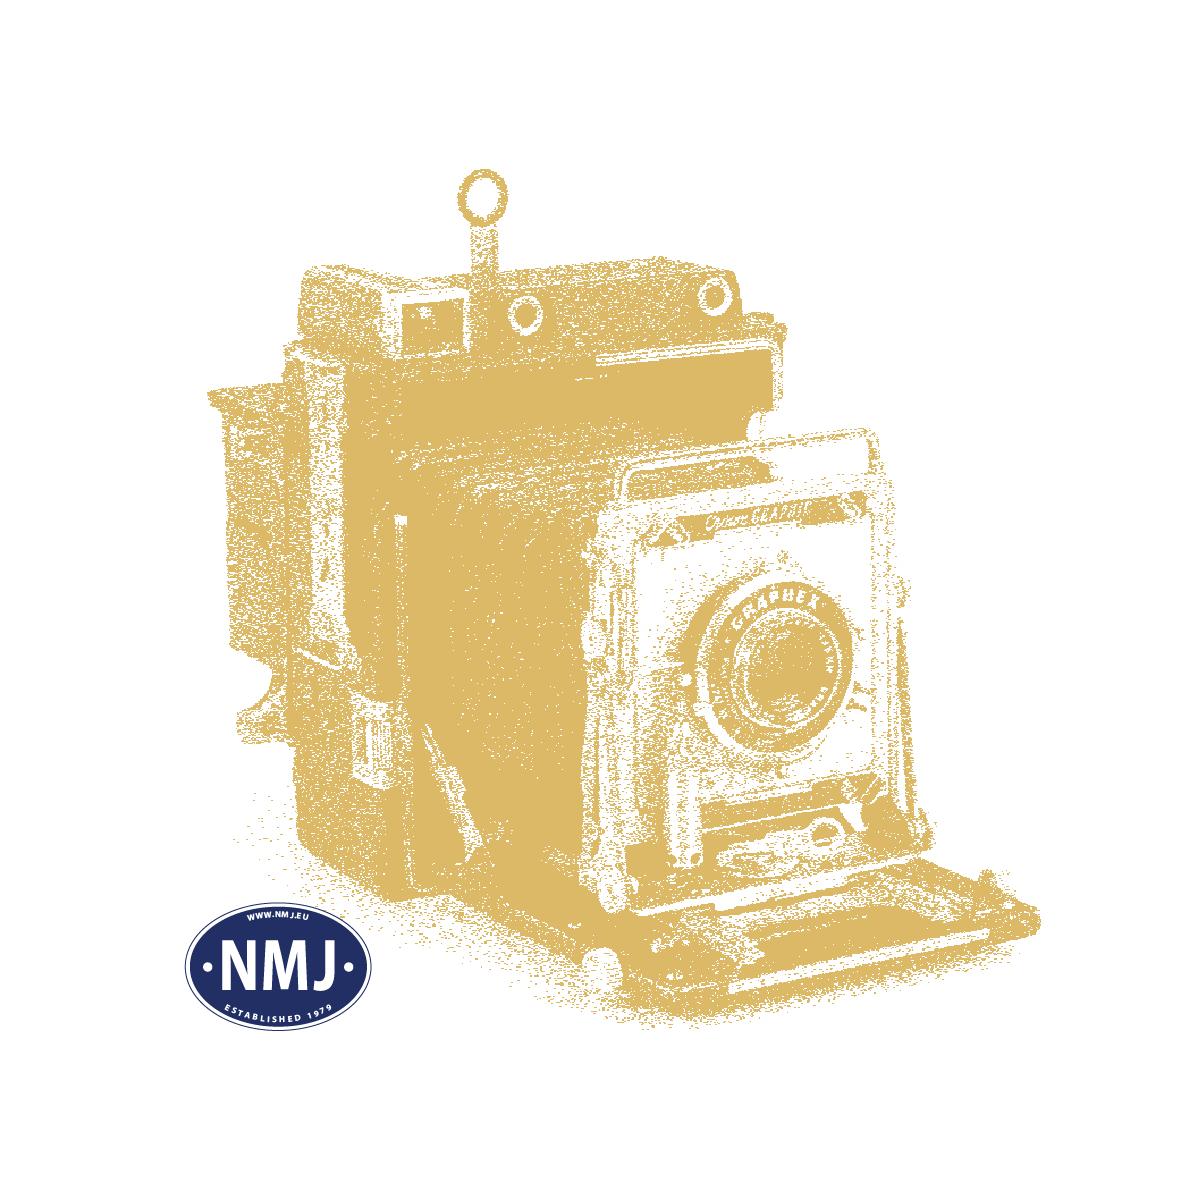 "NMJH15127 - NMJ Skyline Hell Godshus ""Gods - Expedition"",1950-talls utgave, Ferdigmodell"